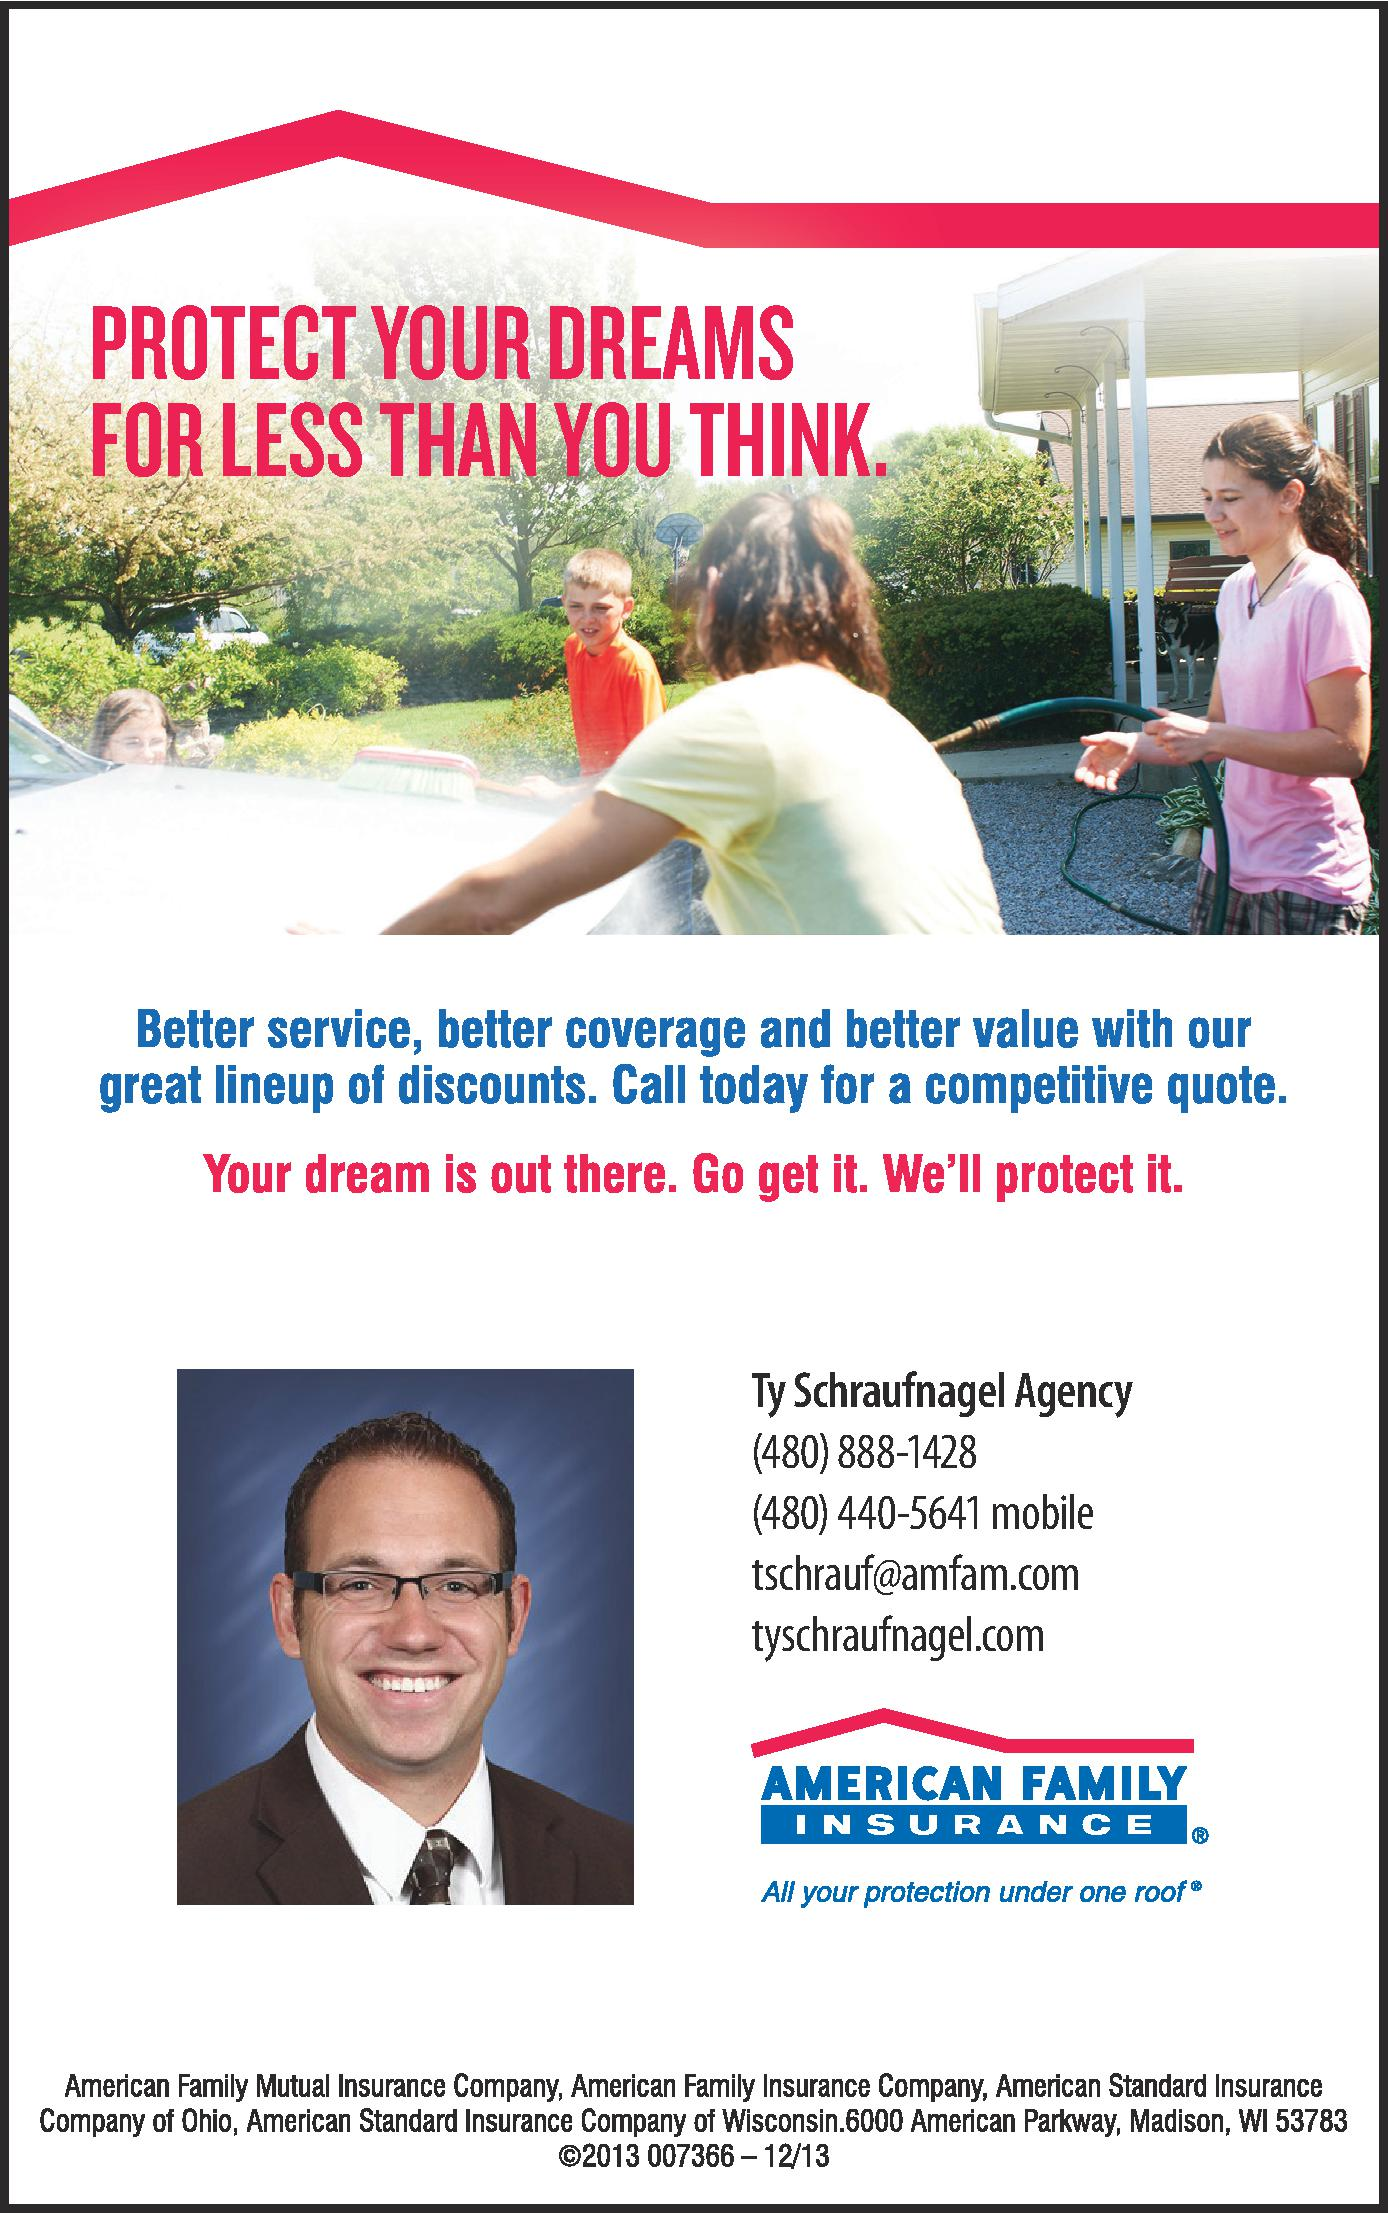 American Family Insurance-Schraufnagel